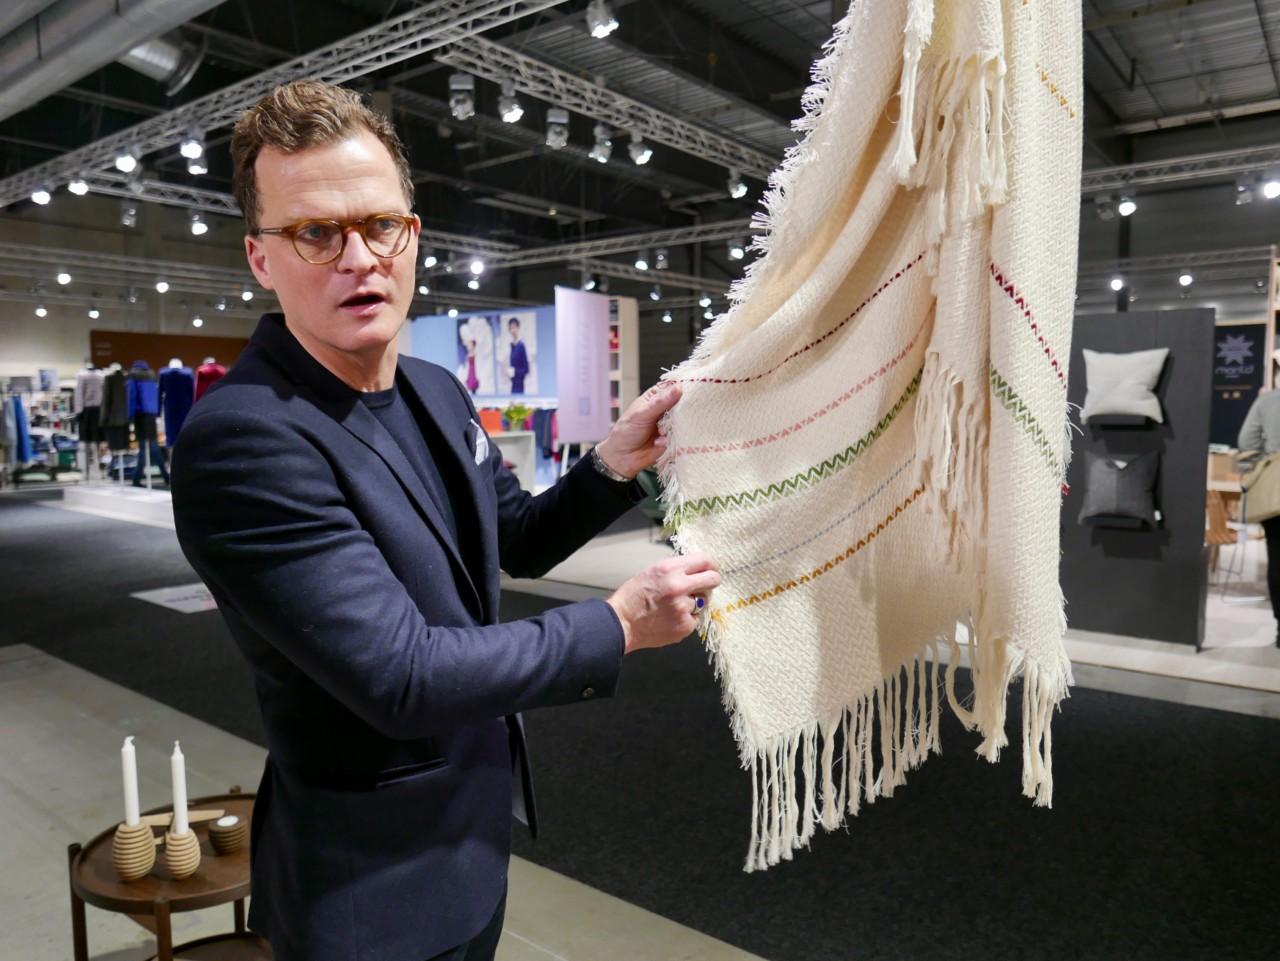 andreas-engesvik-fram-oslo-bunadspleddet-oslo-design-fair